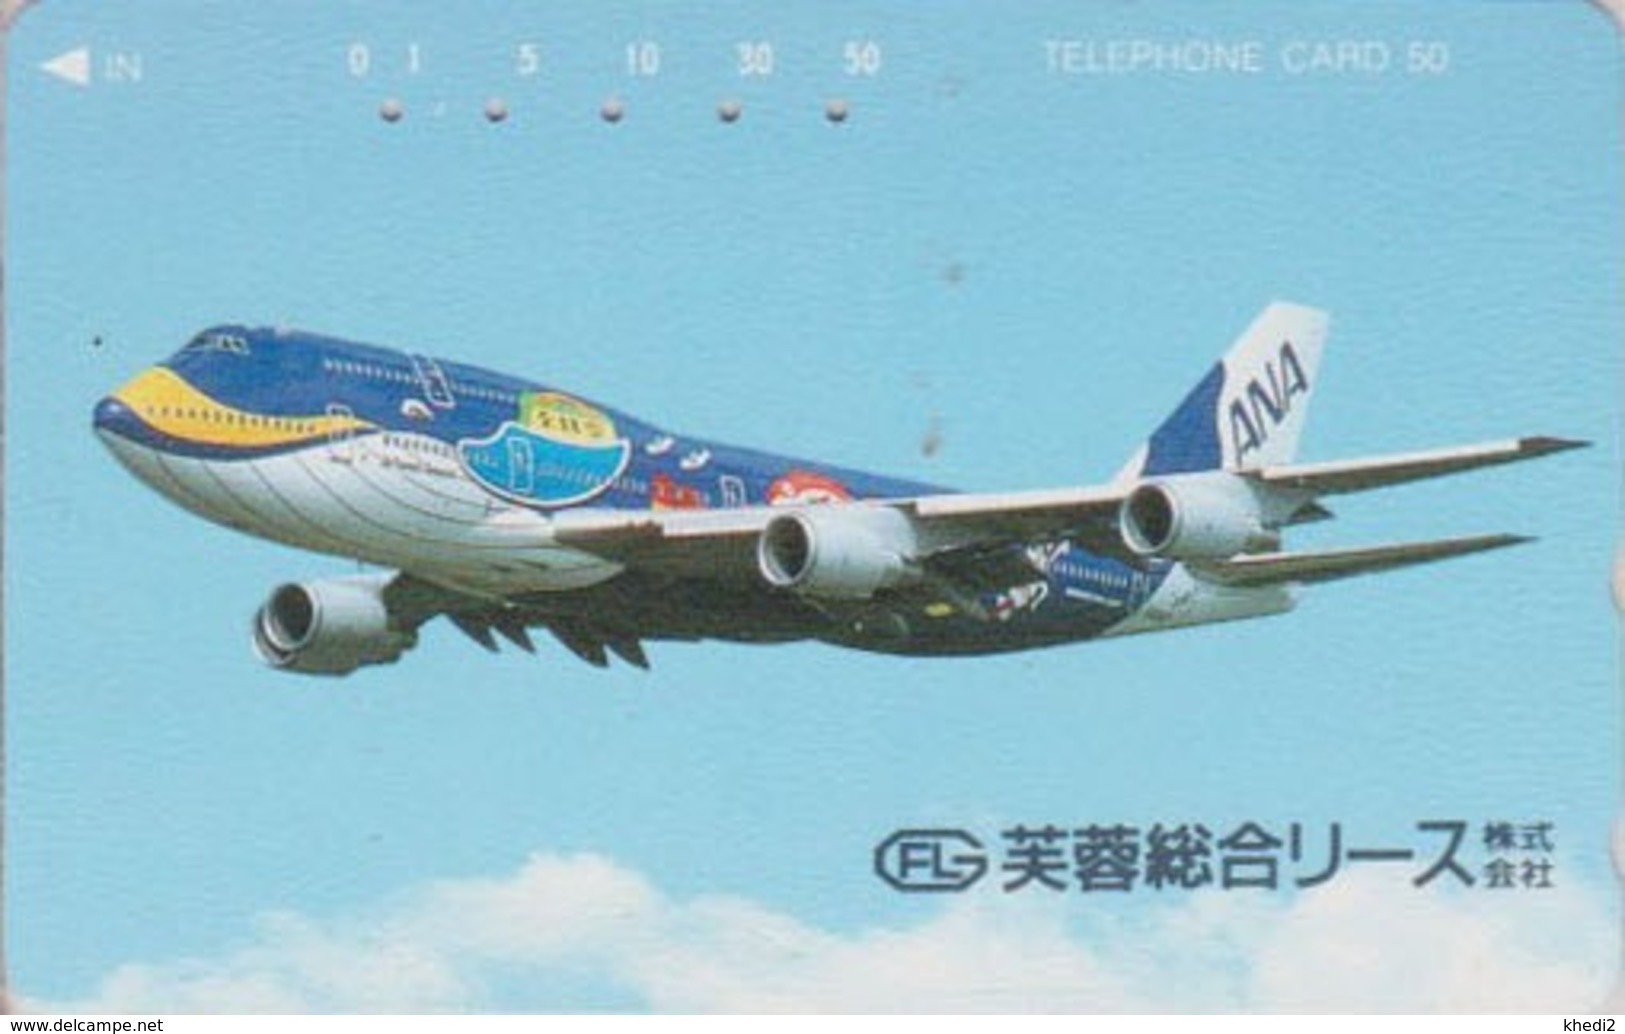 Télécarte Japon / 110-011 - AVION - ANA  ** MARINE JUMBO ** - PLANE Japan Phonecard - Aviation 2302 - Avions